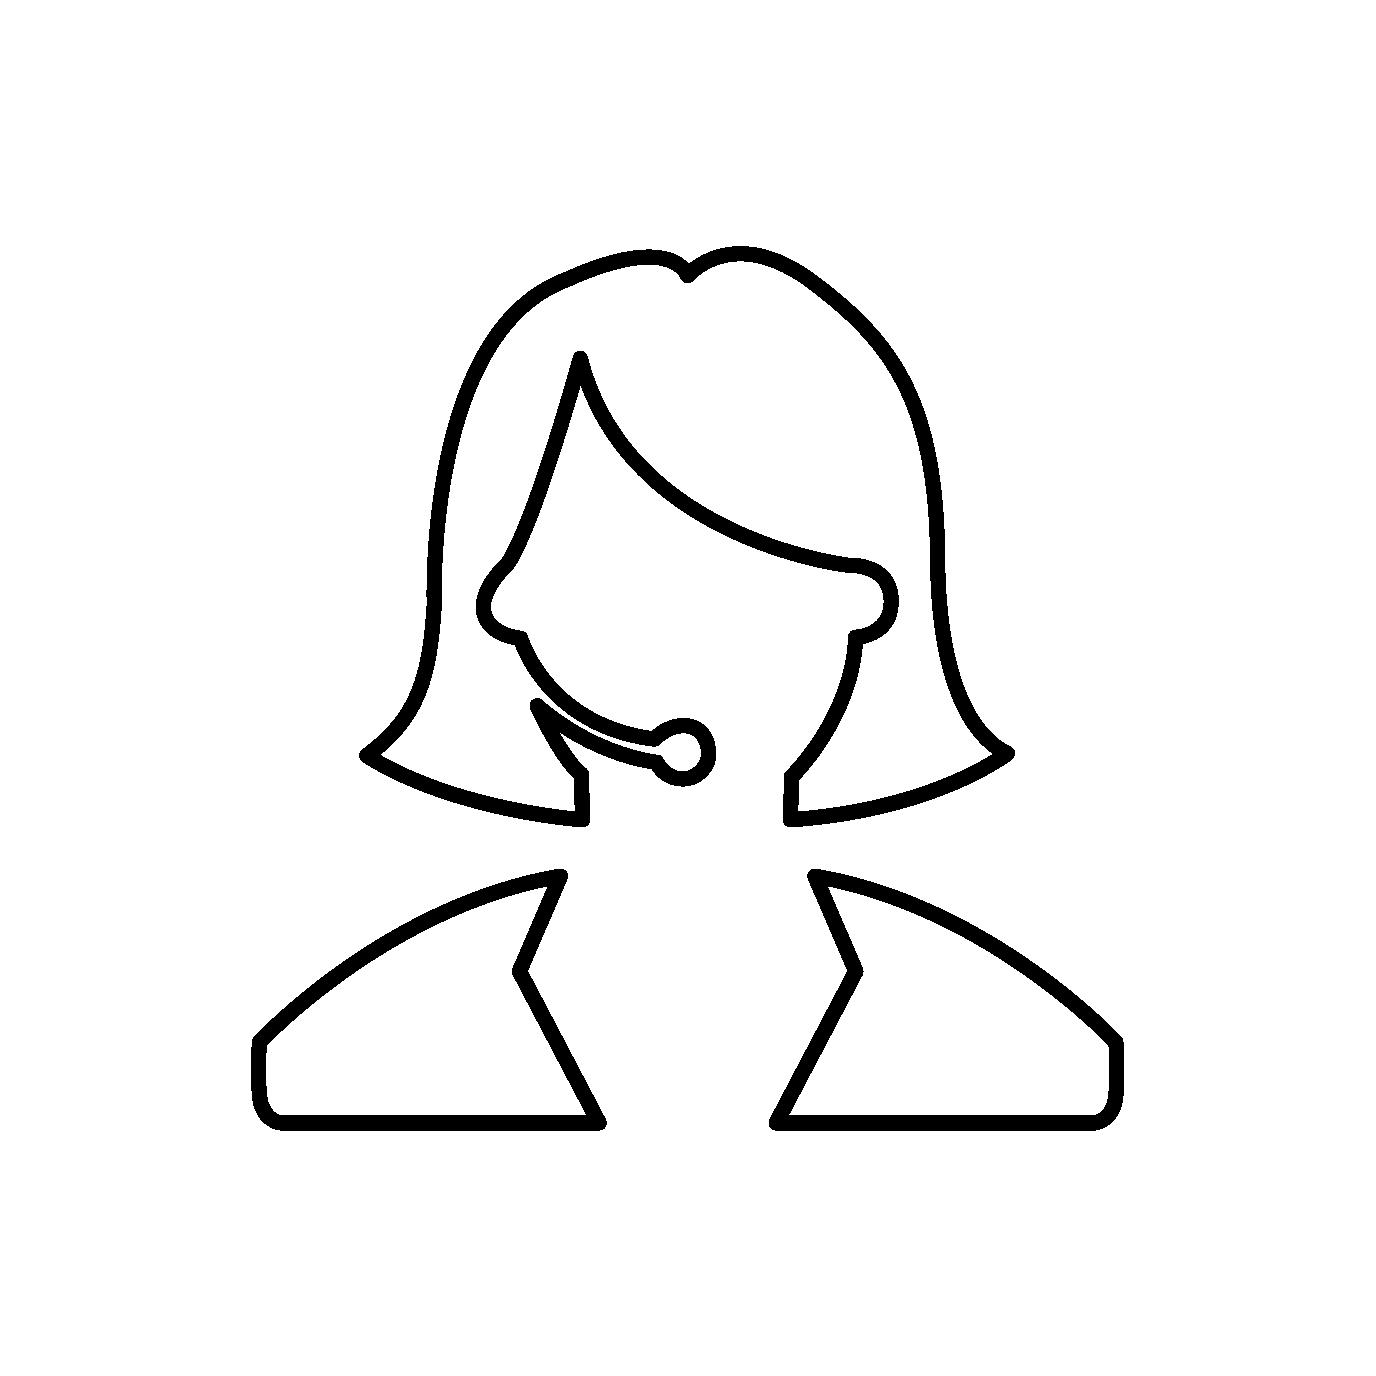 CS_Icon_Support